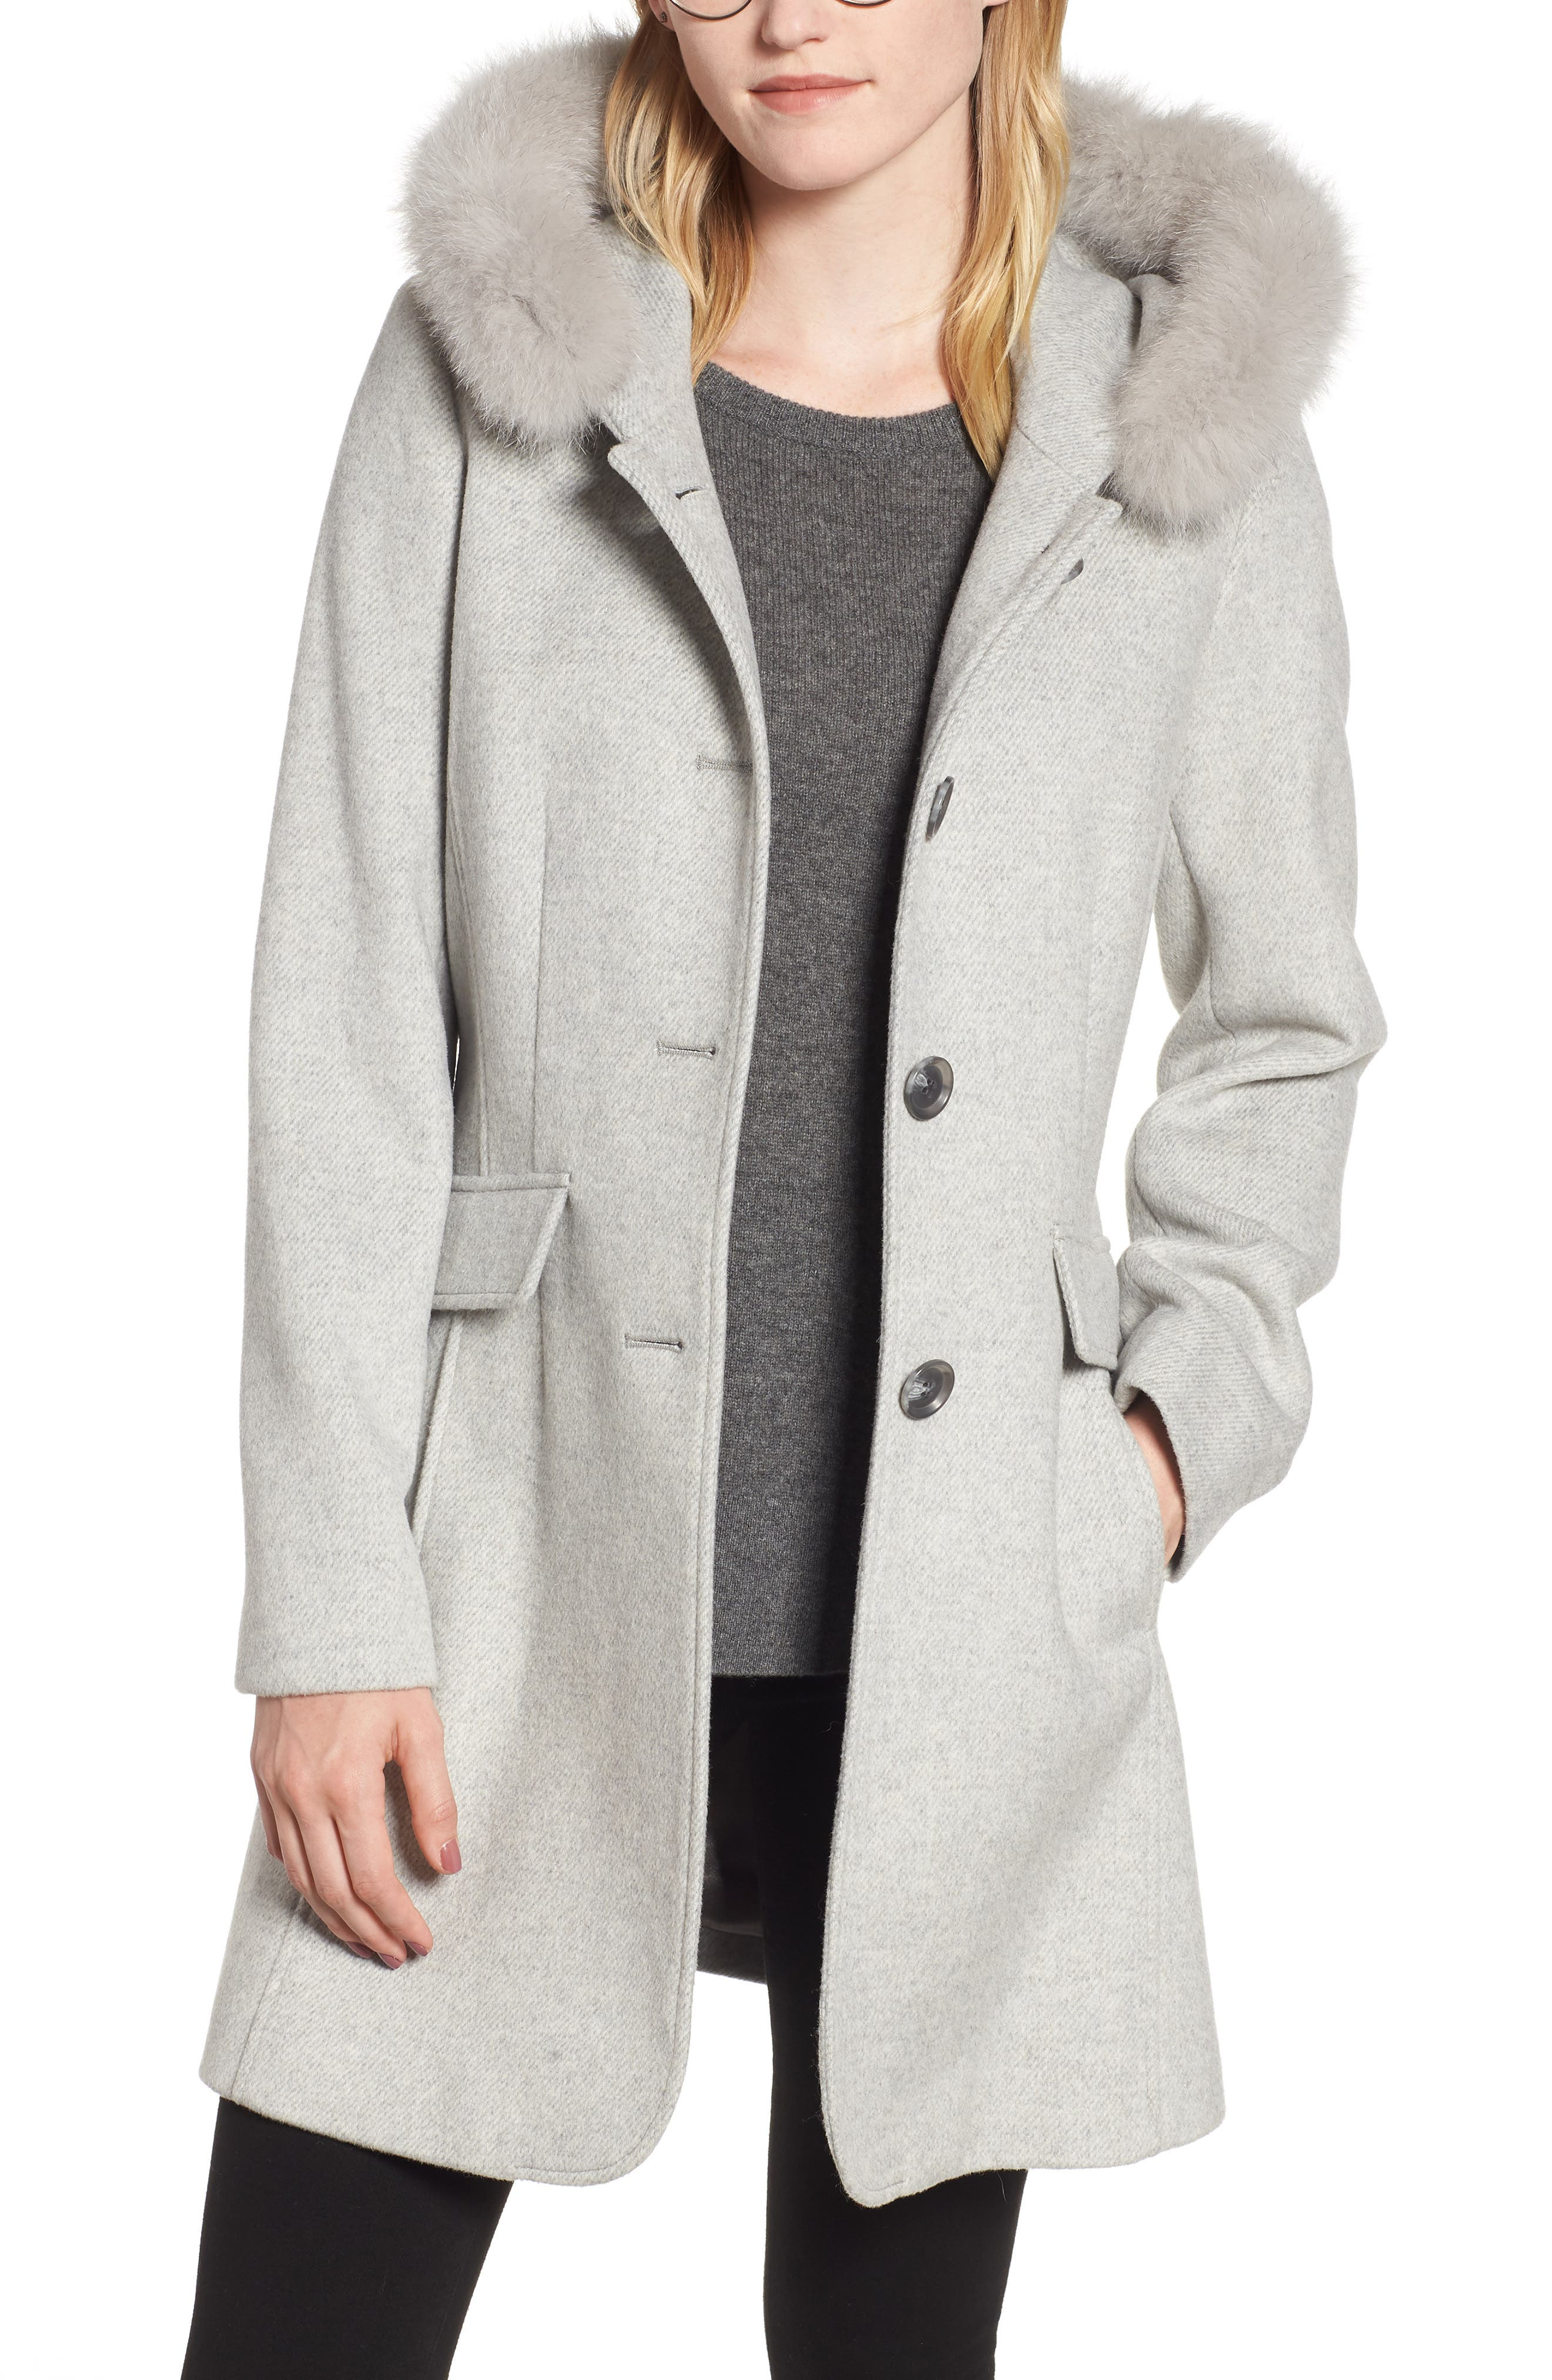 KRISTEN BLAKE,                             Genuine Fox Trim Hooded Wool Coat,                             Main thumbnail 1, color,                             GREY MELANGE